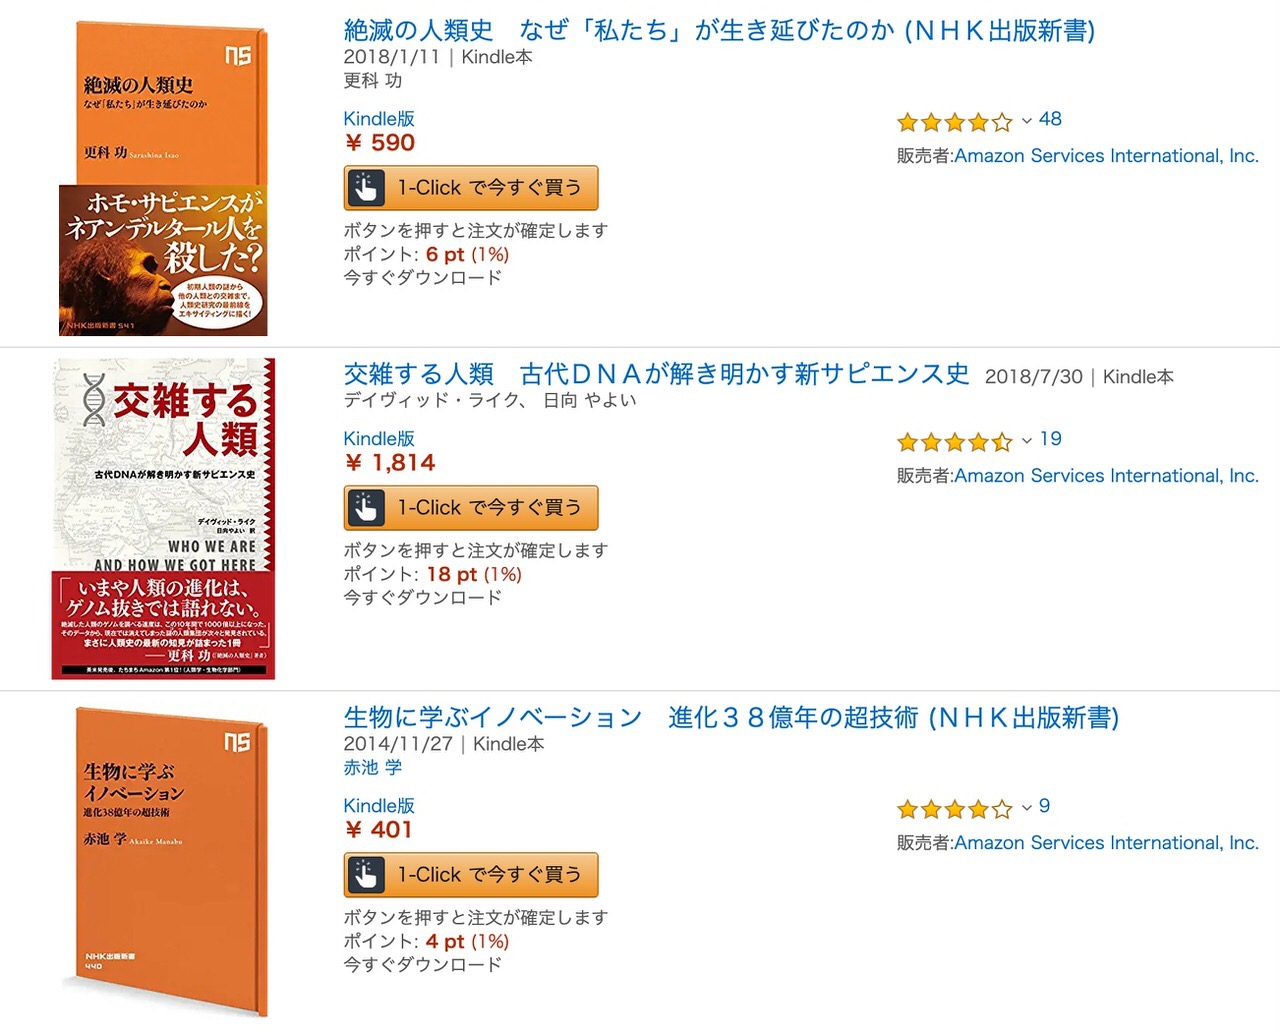 【Kindleセール】絶滅の人類史、ゲノム編集の衝撃、生きものは円柱形など夏休みのおすすめ「理科の本」(8/8まで)